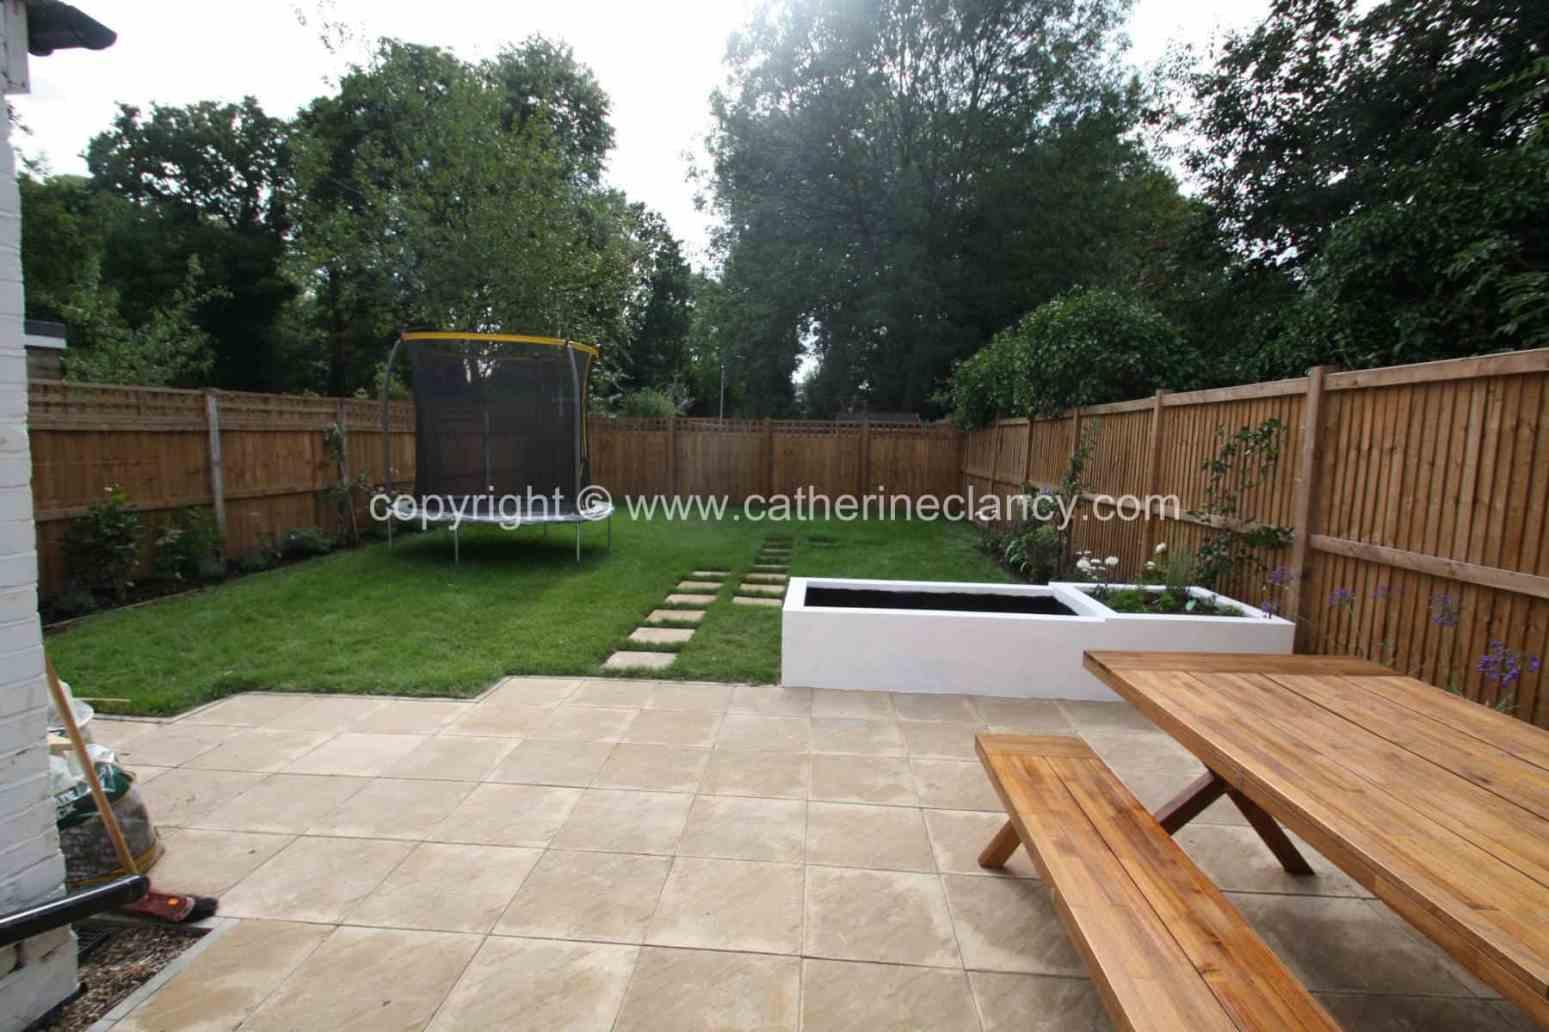 ecostudio-garden-london-6